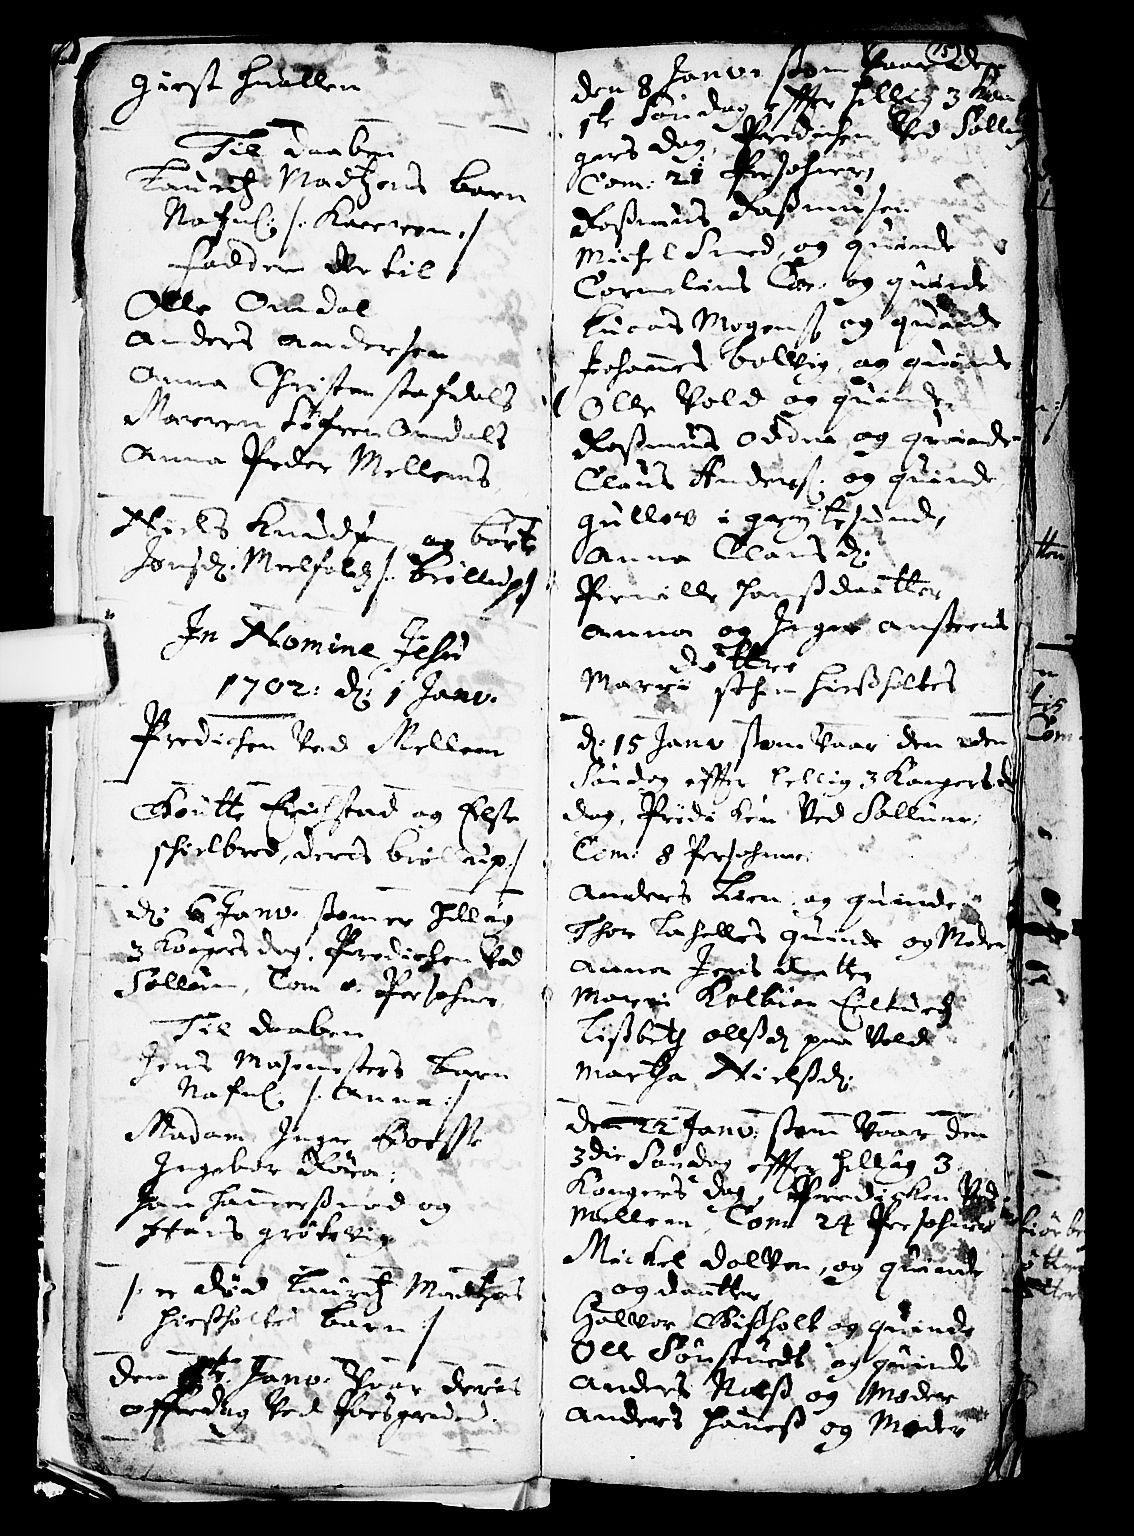 SAKO, Solum kirkebøker, F/Fa/L0001: Ministerialbok nr. I 1, 1701-1716, s. 15